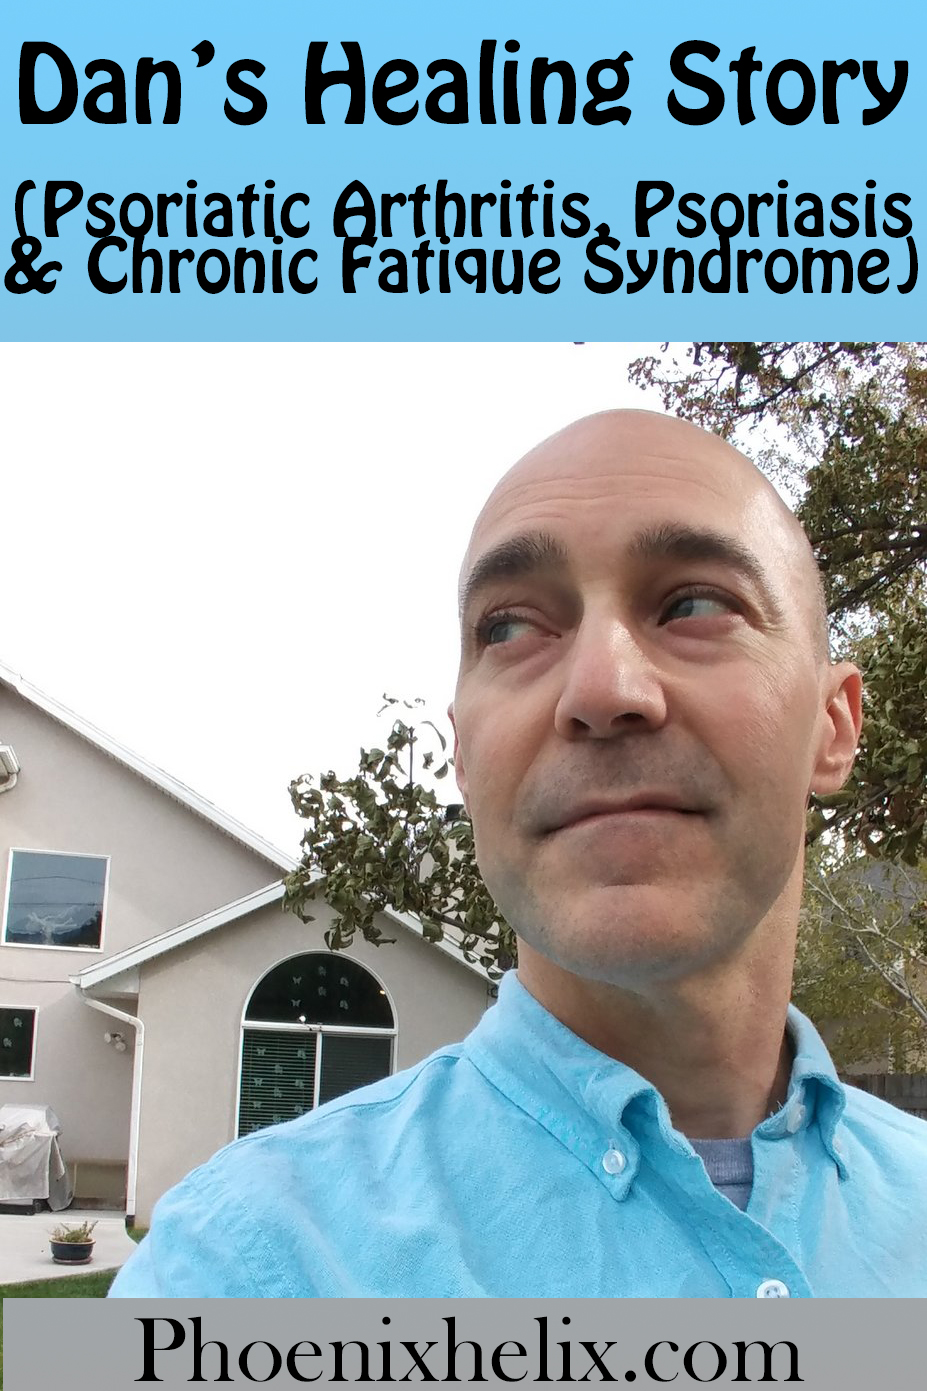 Dan's Healing Story (Psoriatic Arthritis, Psoriasis & Chronic Fatigue Syndrome) | Phoenix Helix